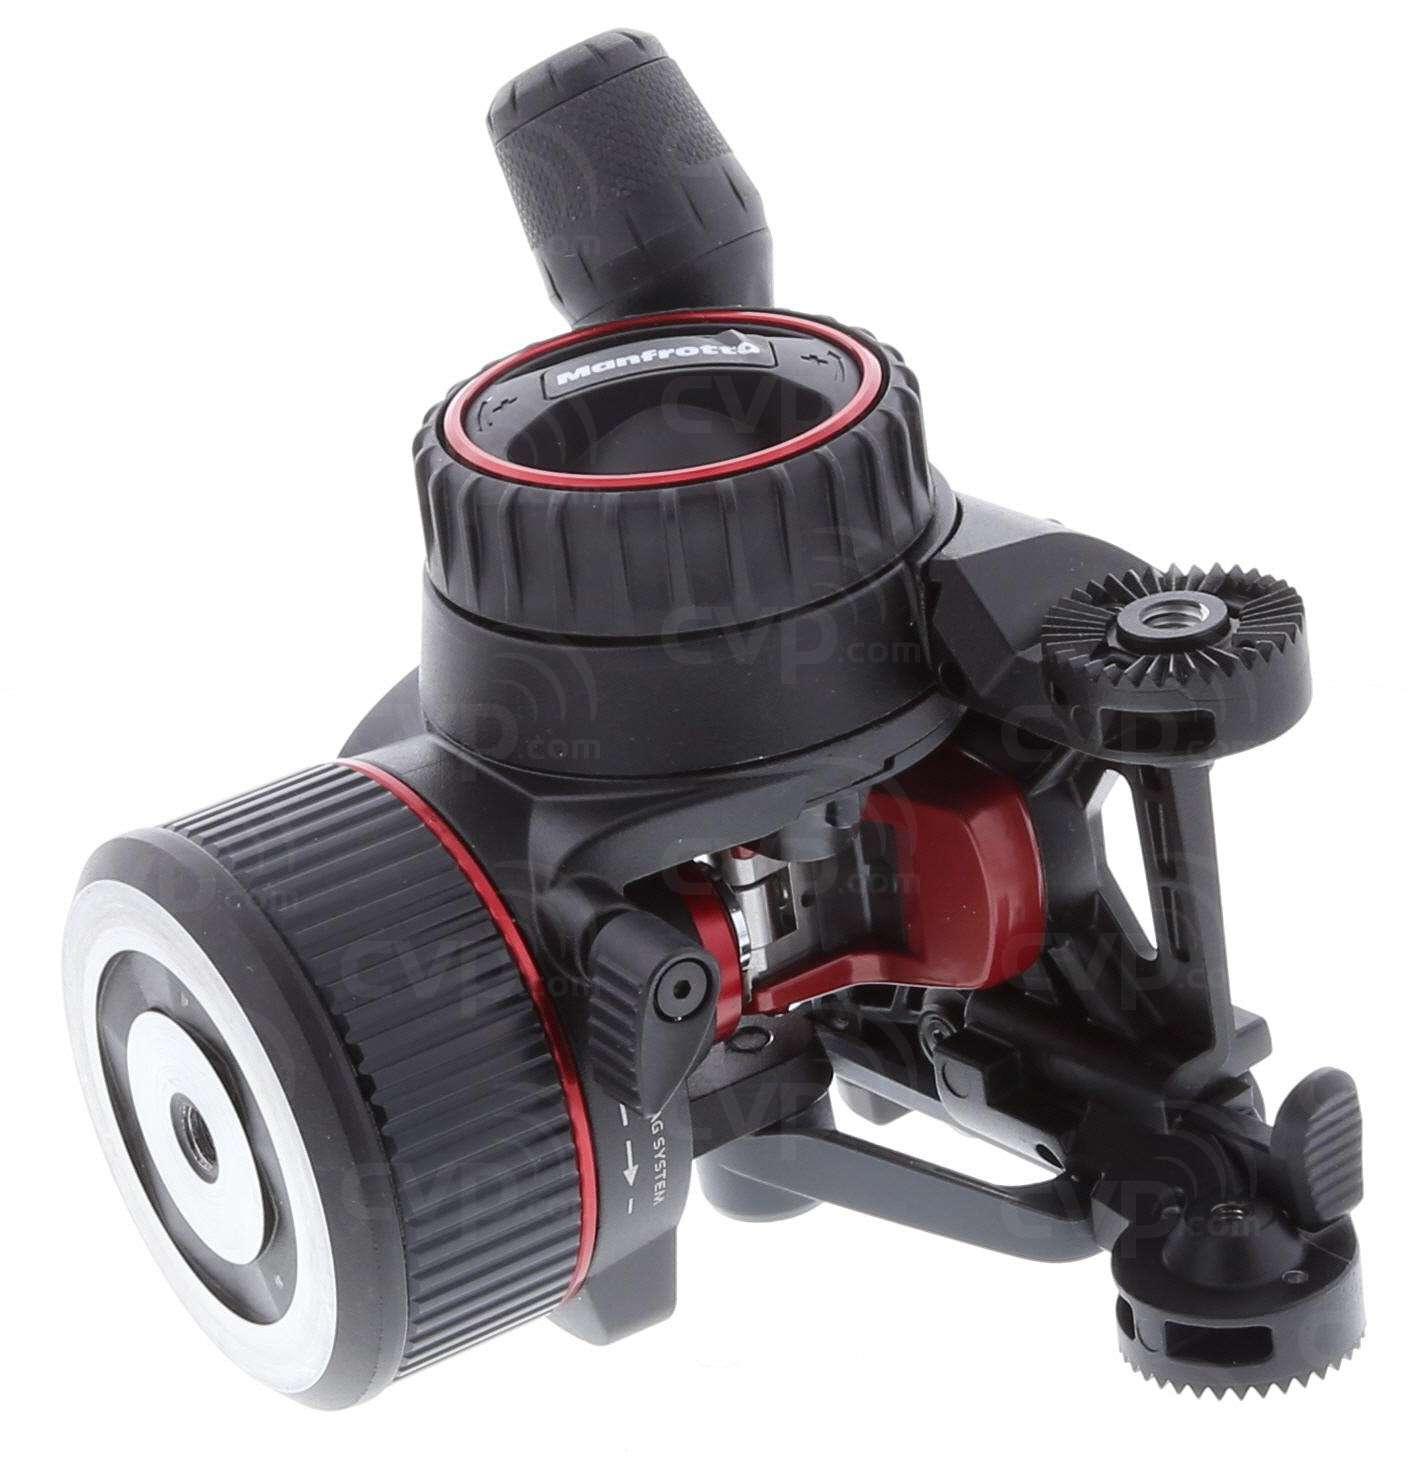 Buy Ex Demo Manfrotto Mvhn8ah Mvh N8ah Nitrotech N8 Fluid Video Head Mvh500ah